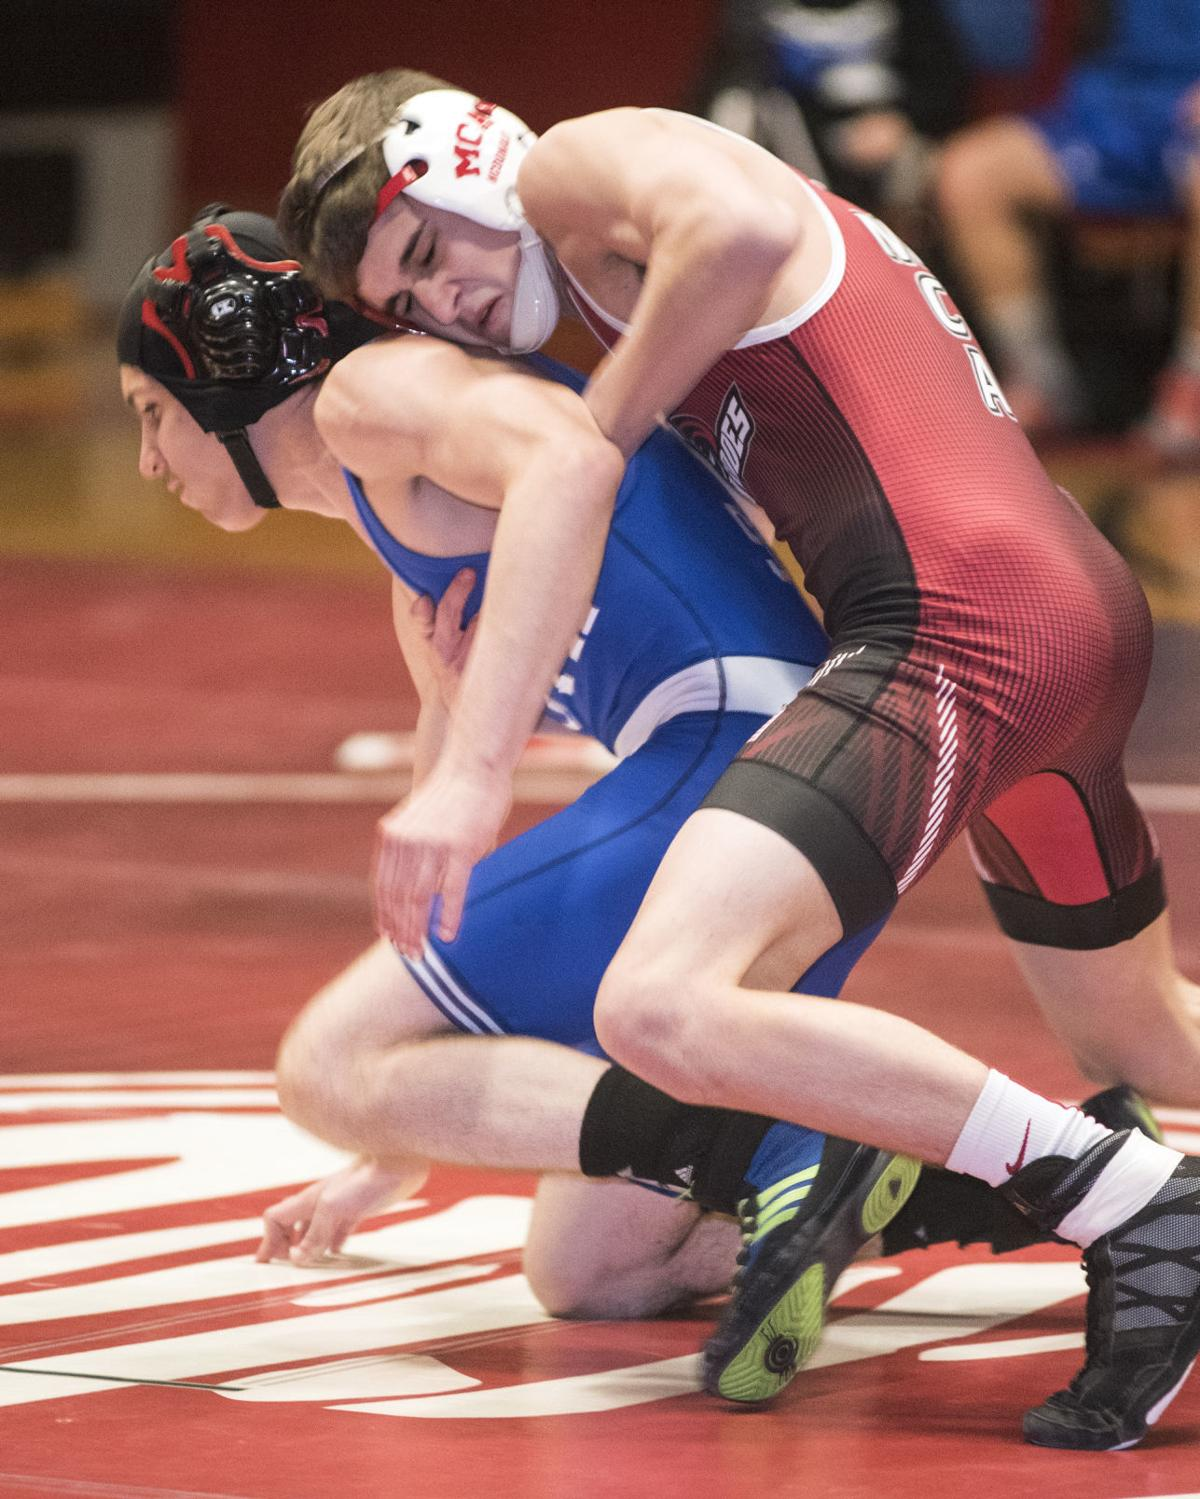 H.S. Wrestling: Mount Carmel defeats South Williamsport